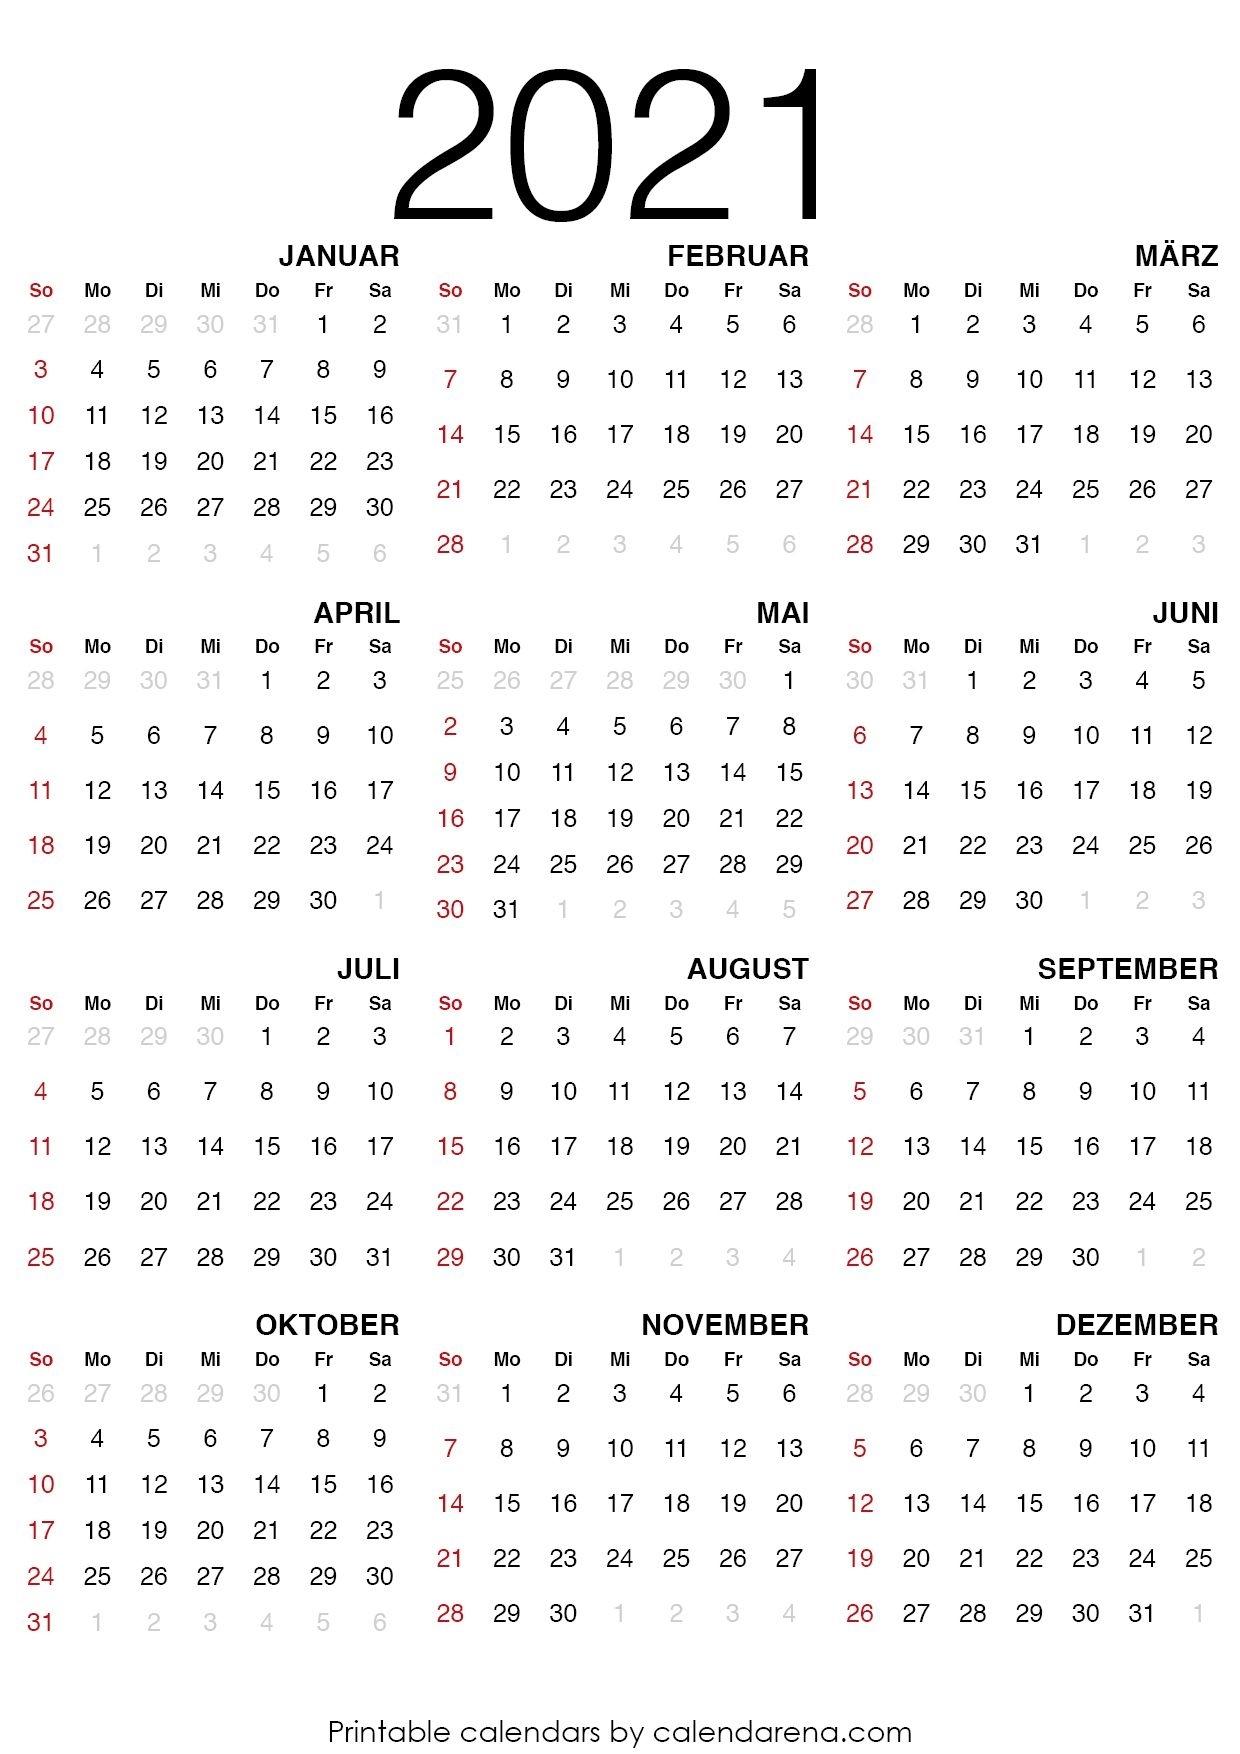 Get Kw Kalender 2021 Dezember | Best Calendar Example